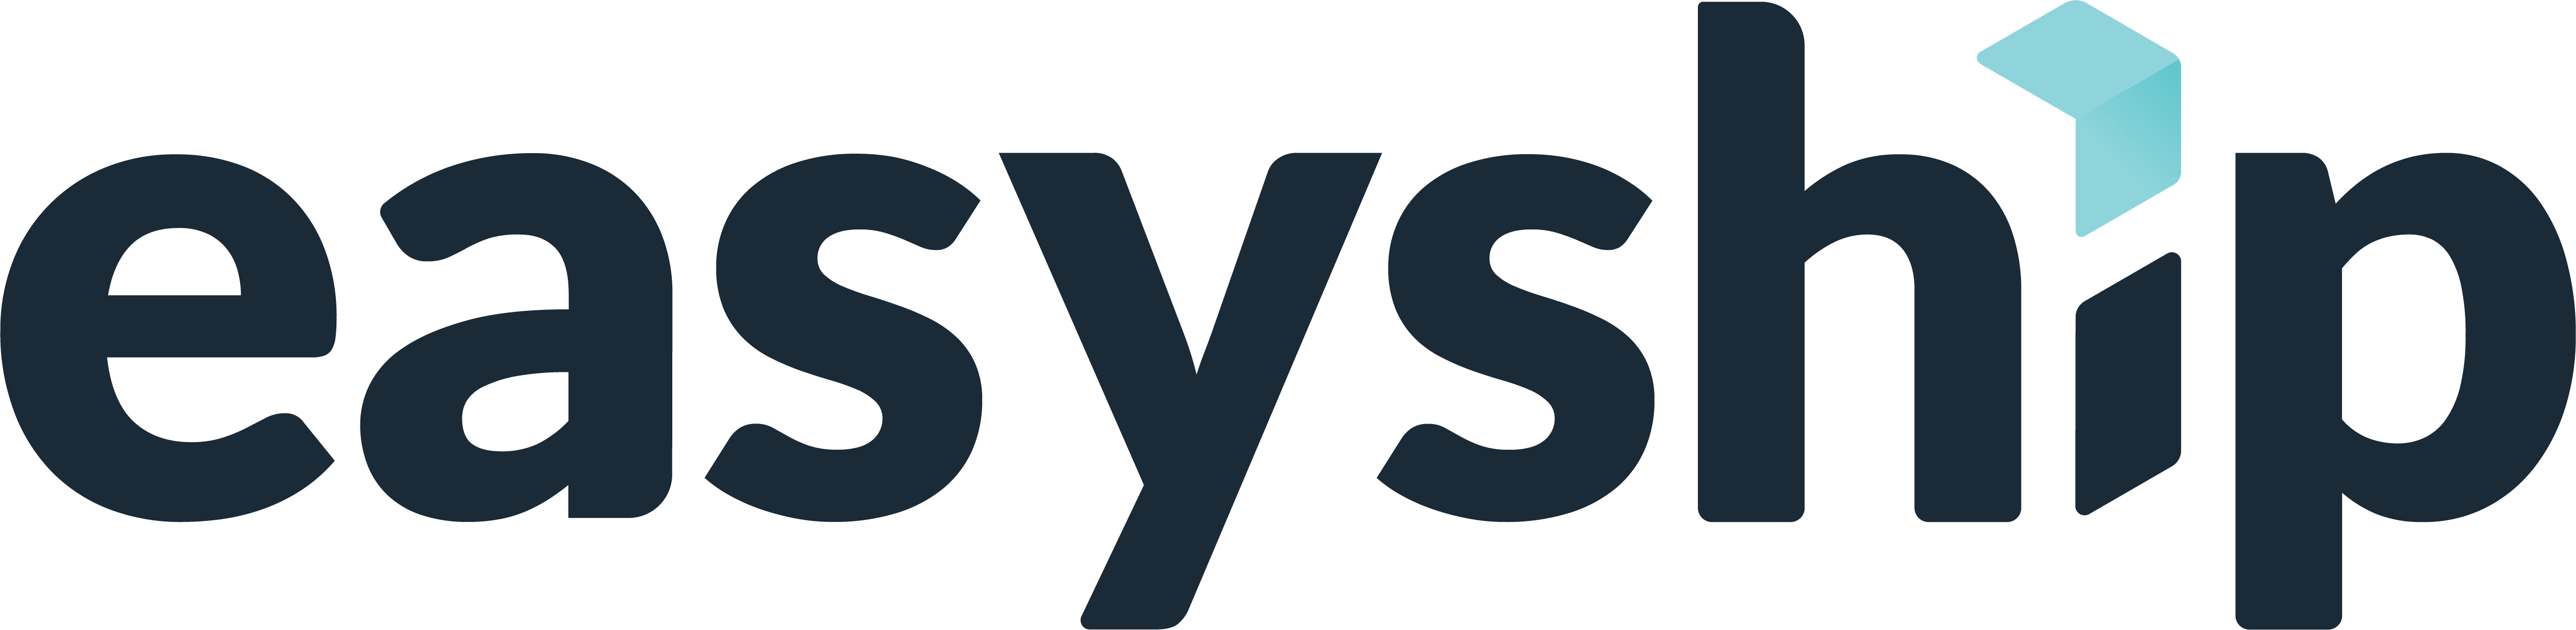 Easyship Logo - Dark